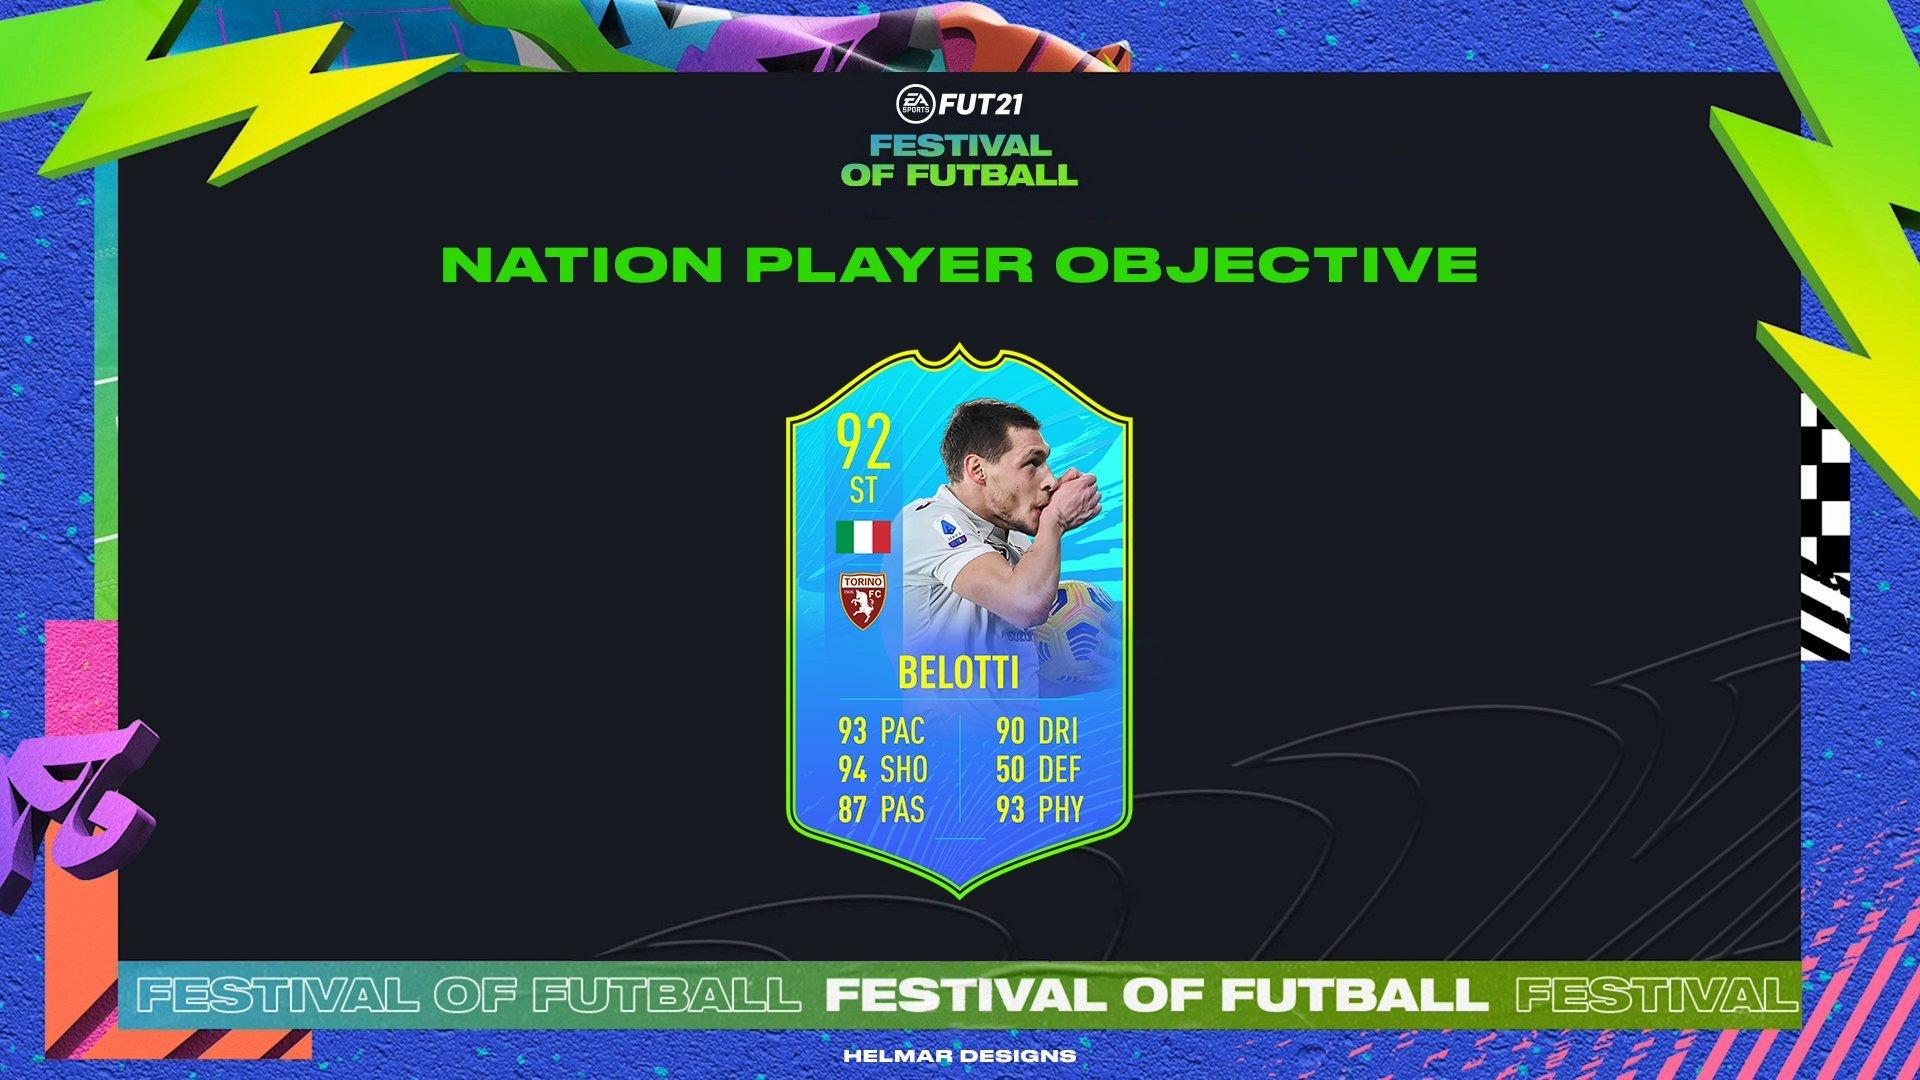 Andrea Belotti Nacion Festival de FUTbol FIFA 21